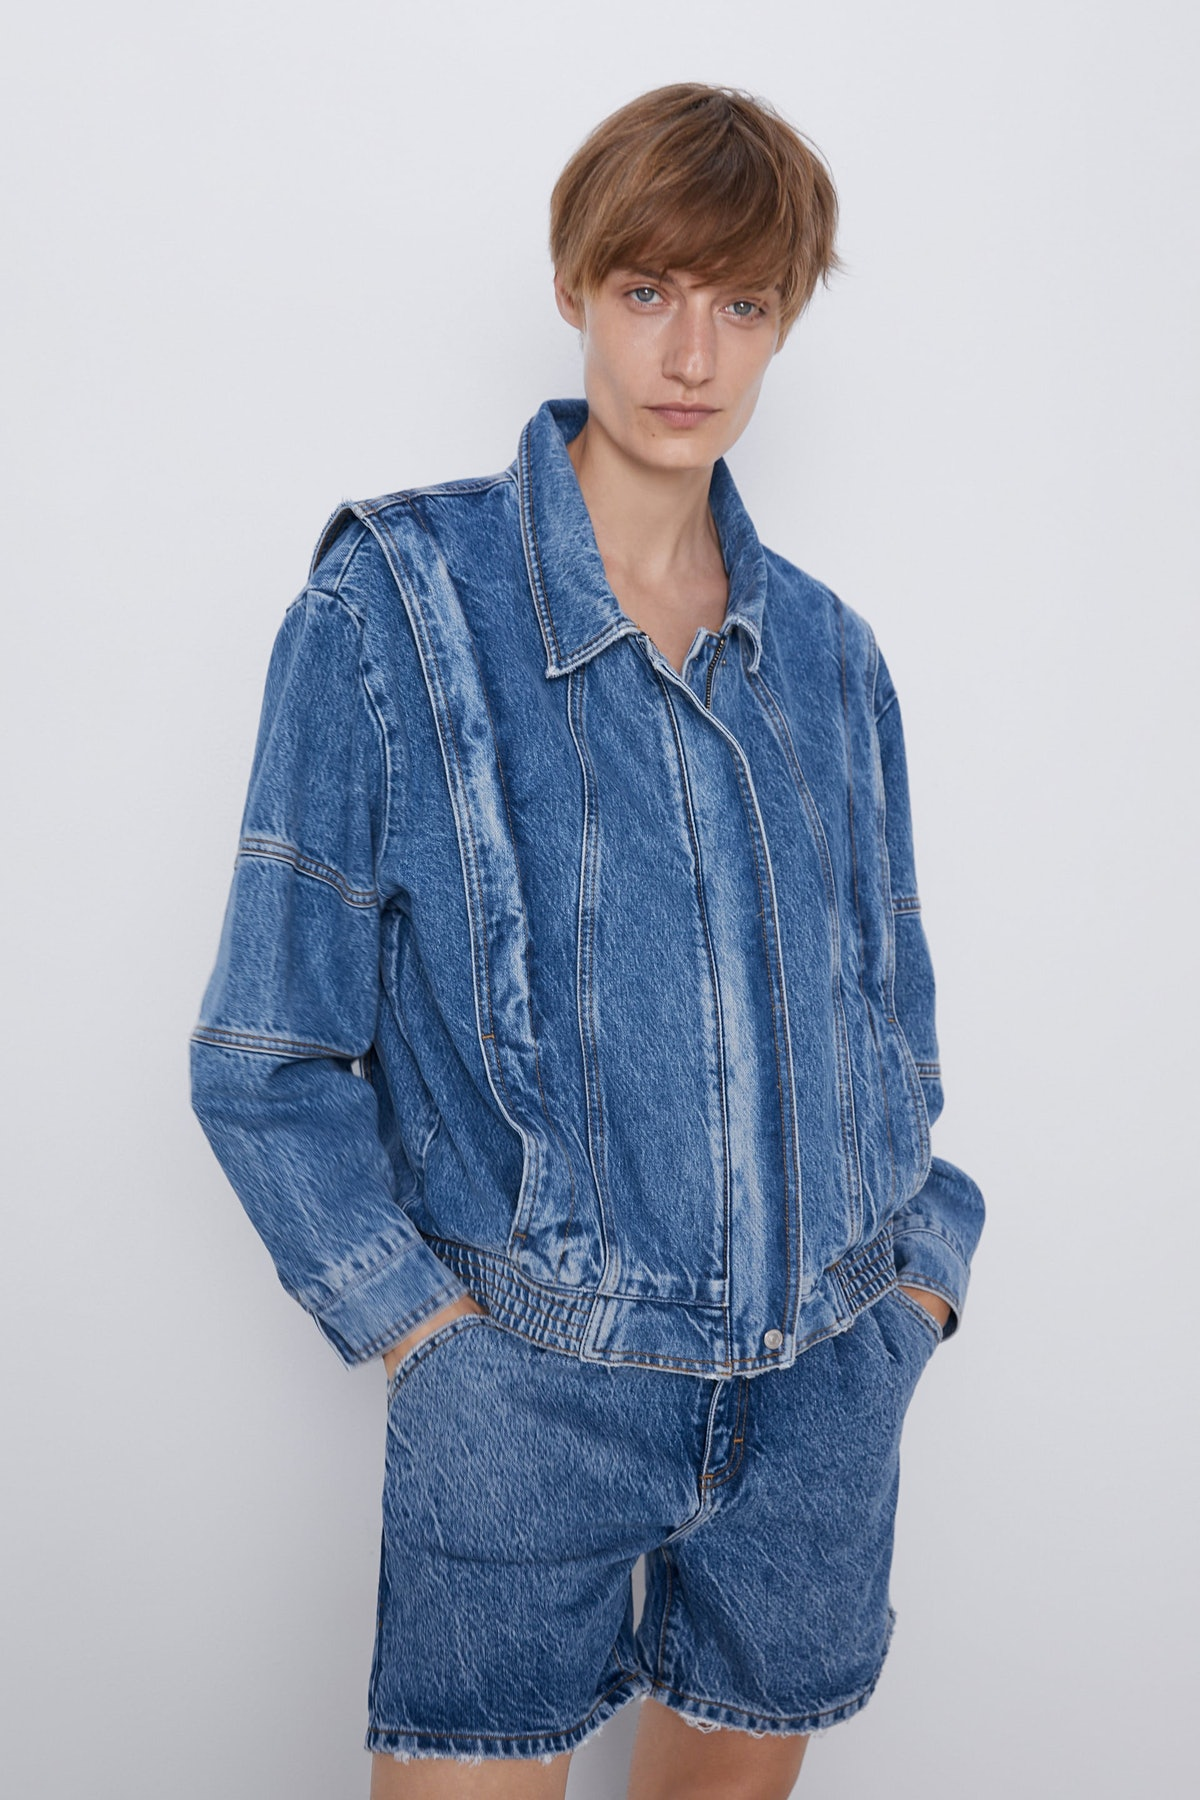 '80s Jacket In Arizona Blue